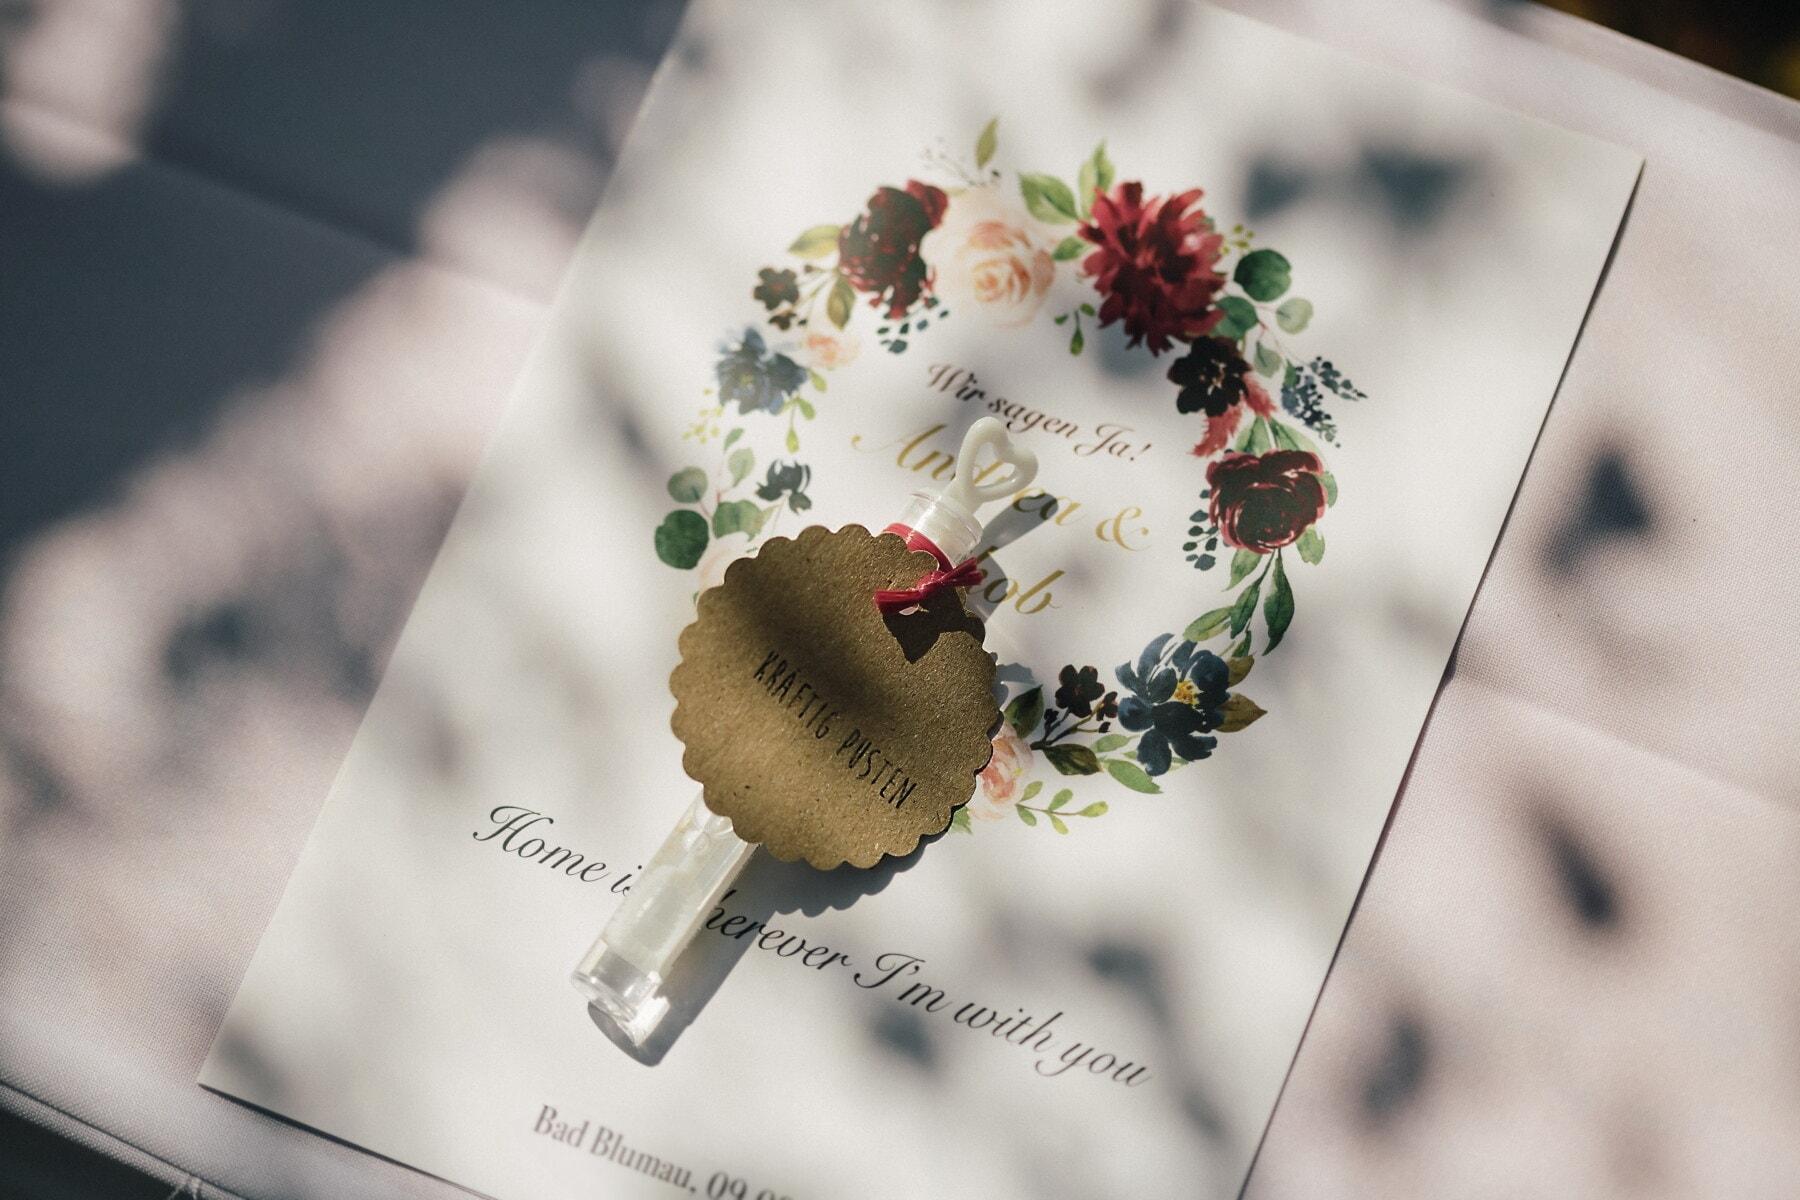 message, Valentine's day, love, card, paper, outdoors, retro, blur, still life, vintage